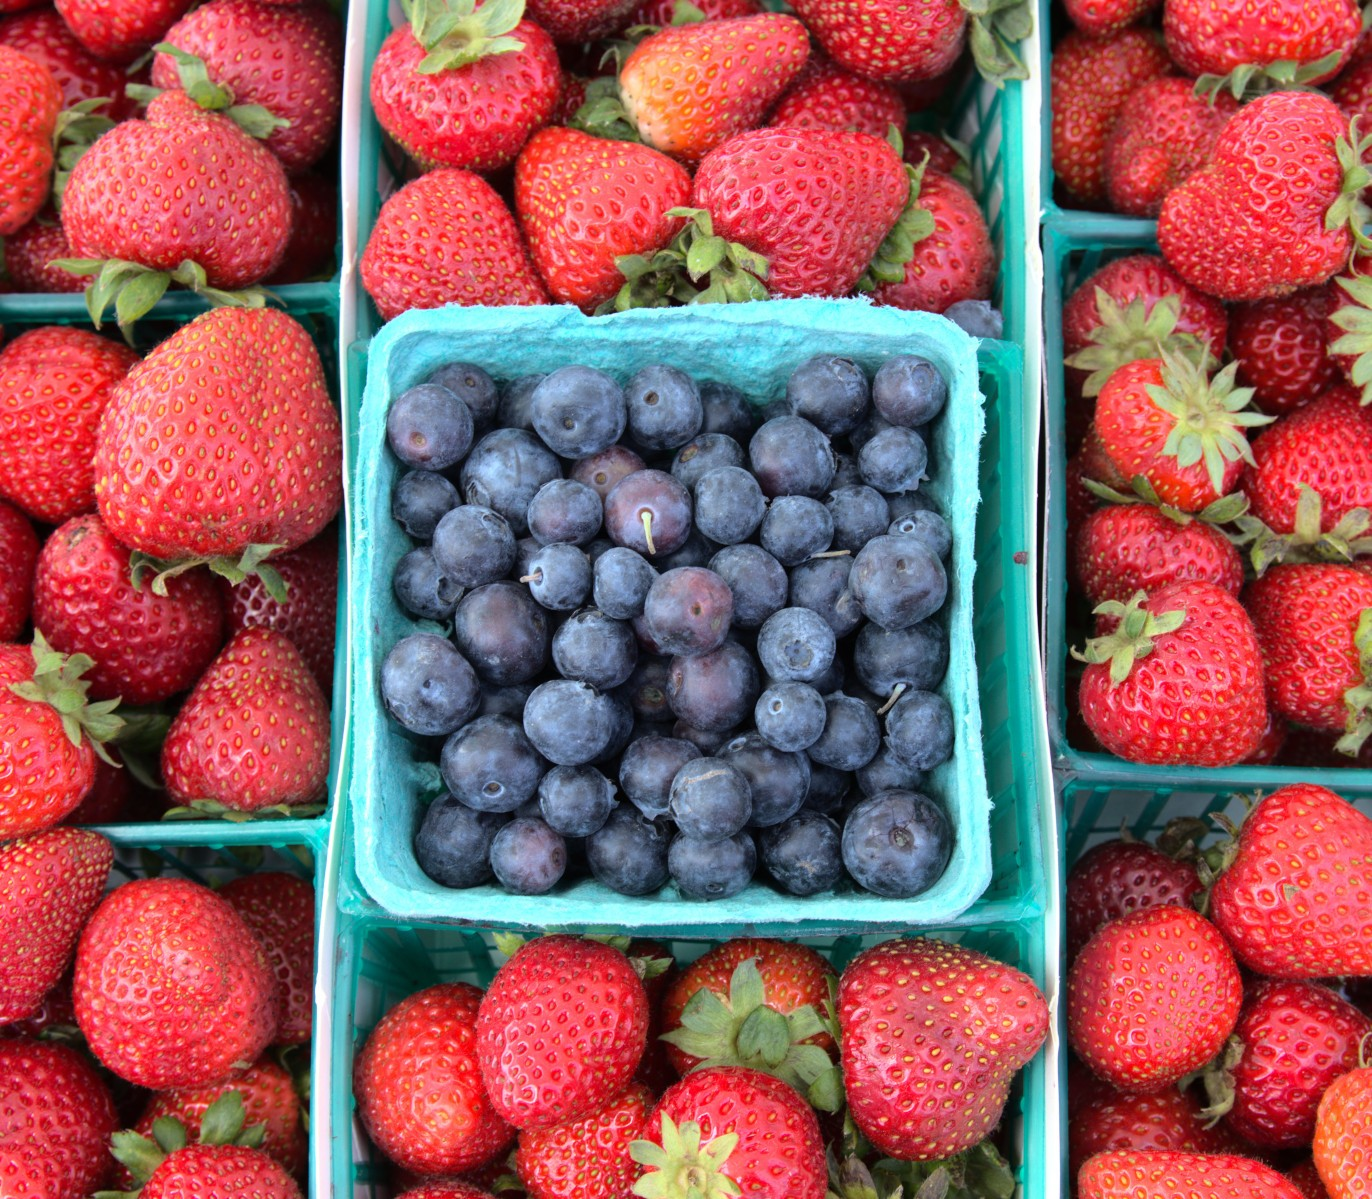 Blueberries sml 3583.jpeg